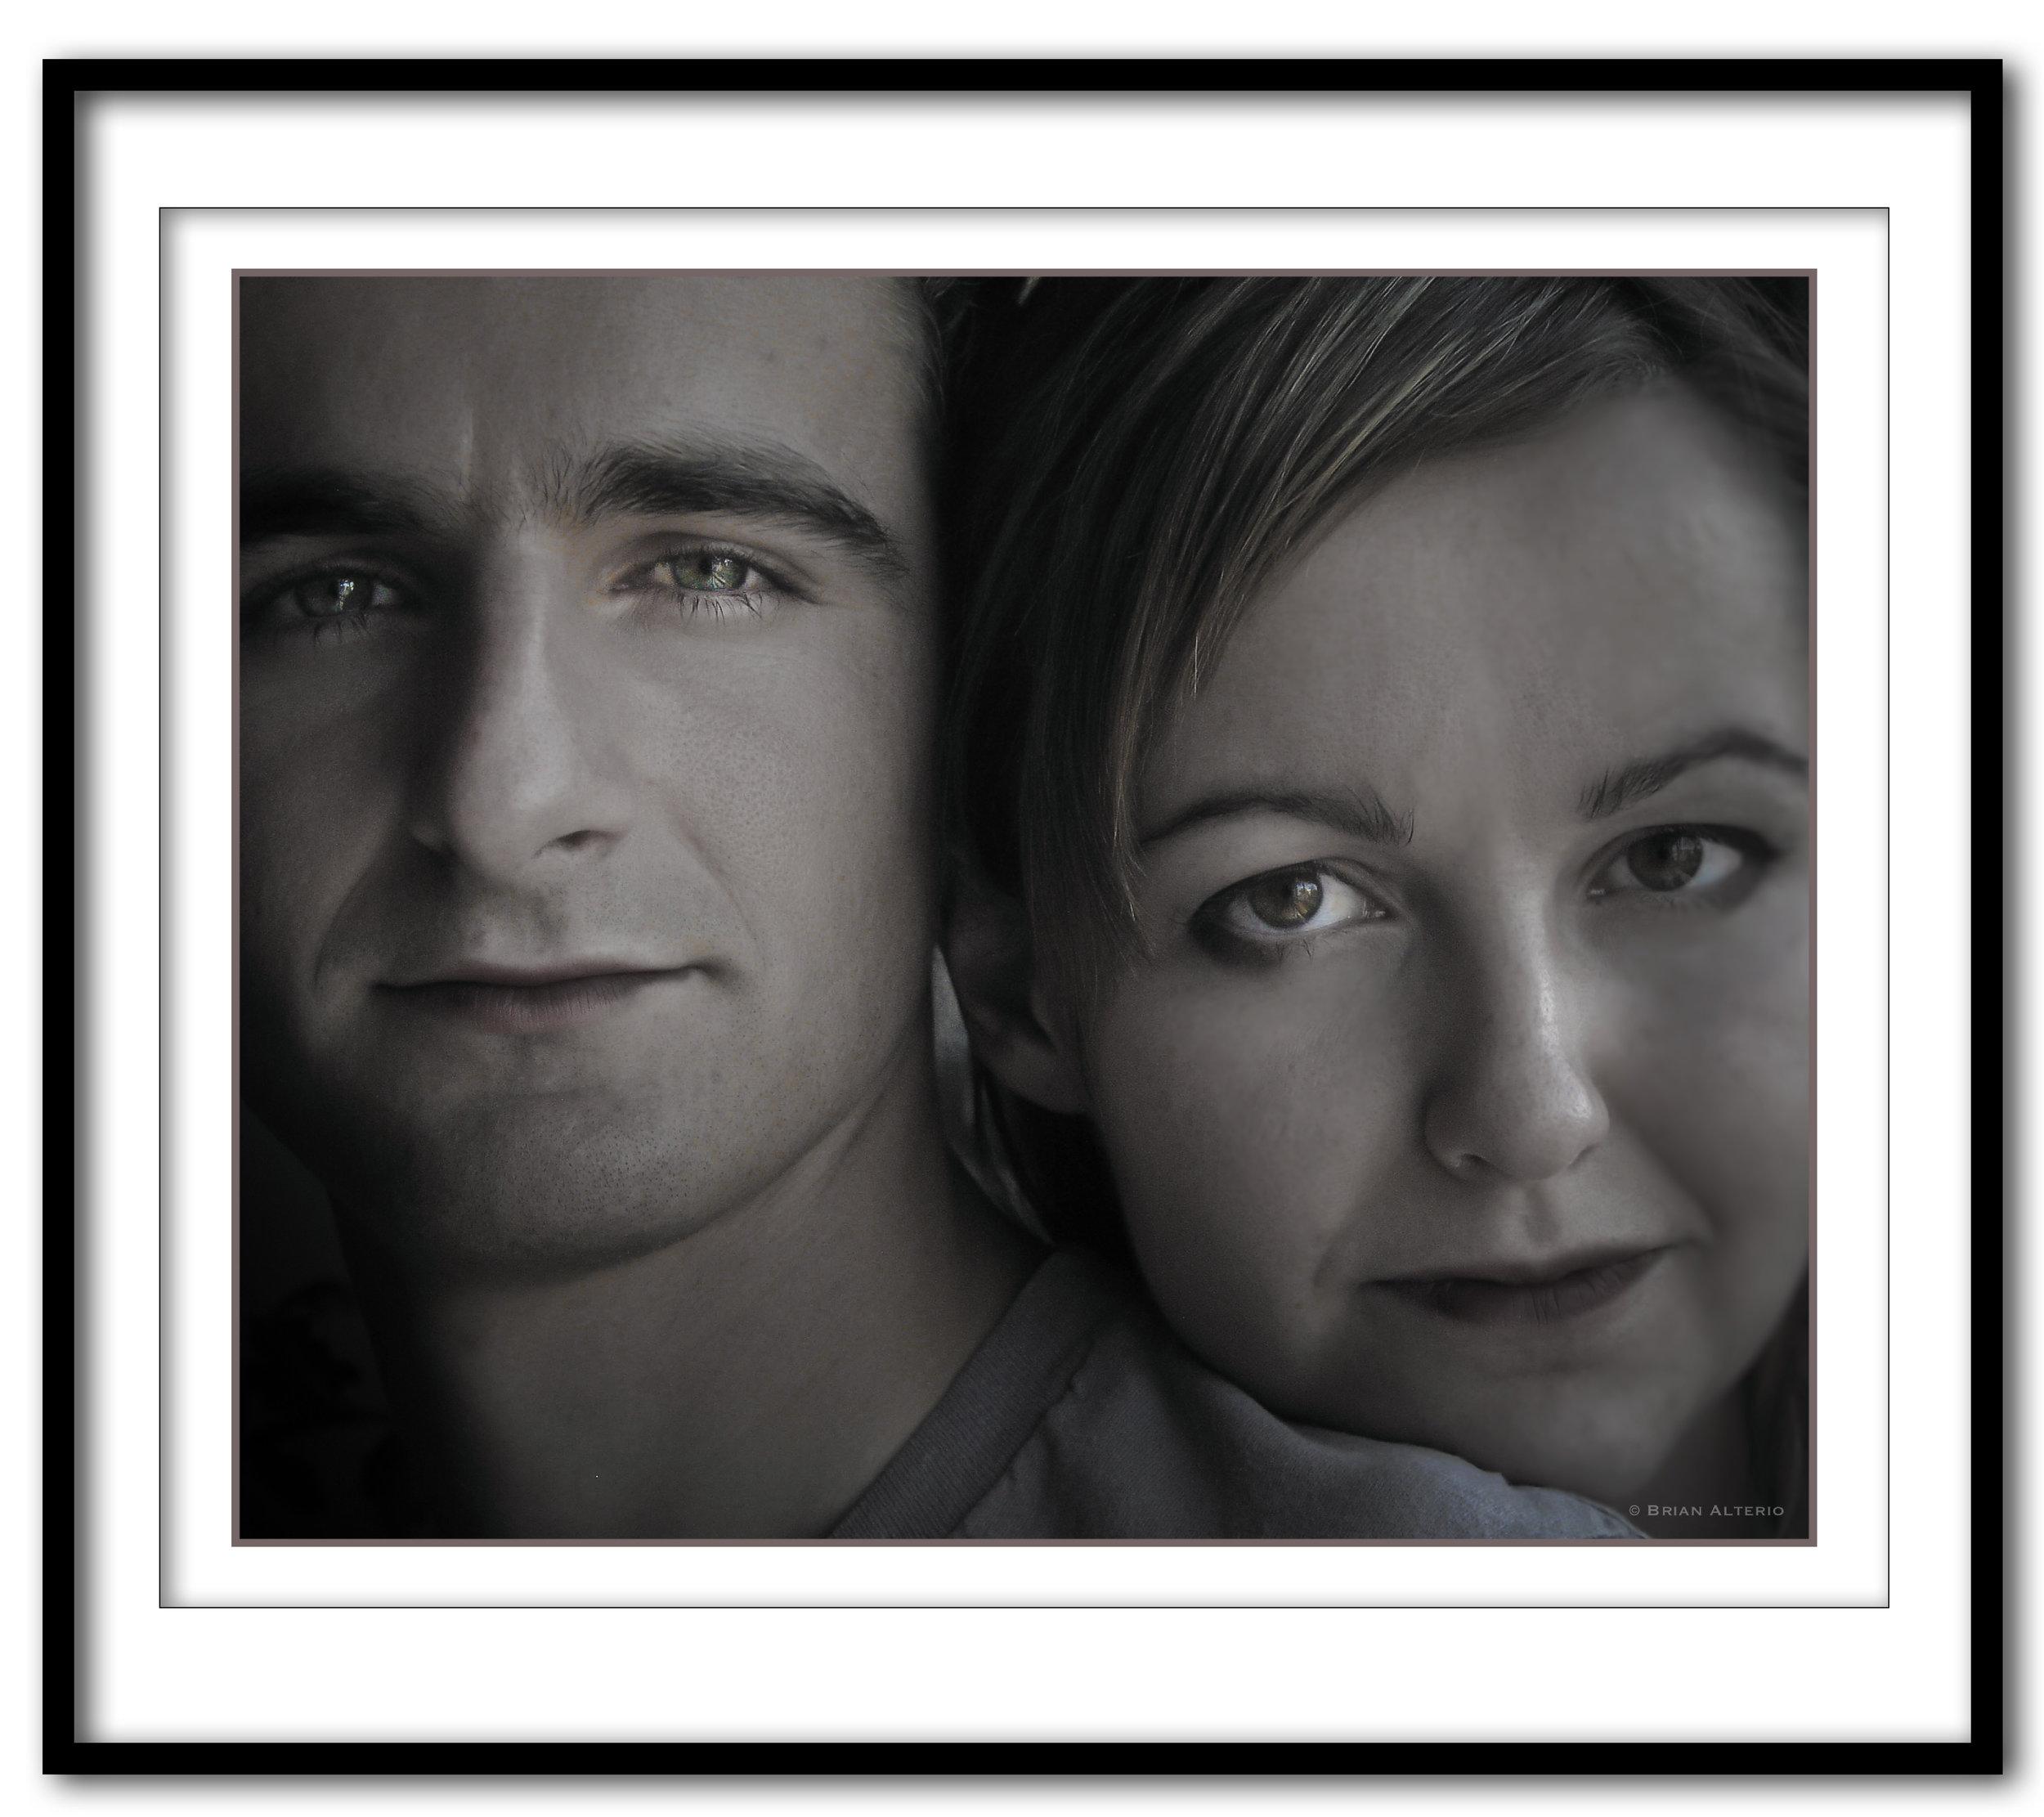 Joe&Mollly - wedding portrait - Framed.jpg